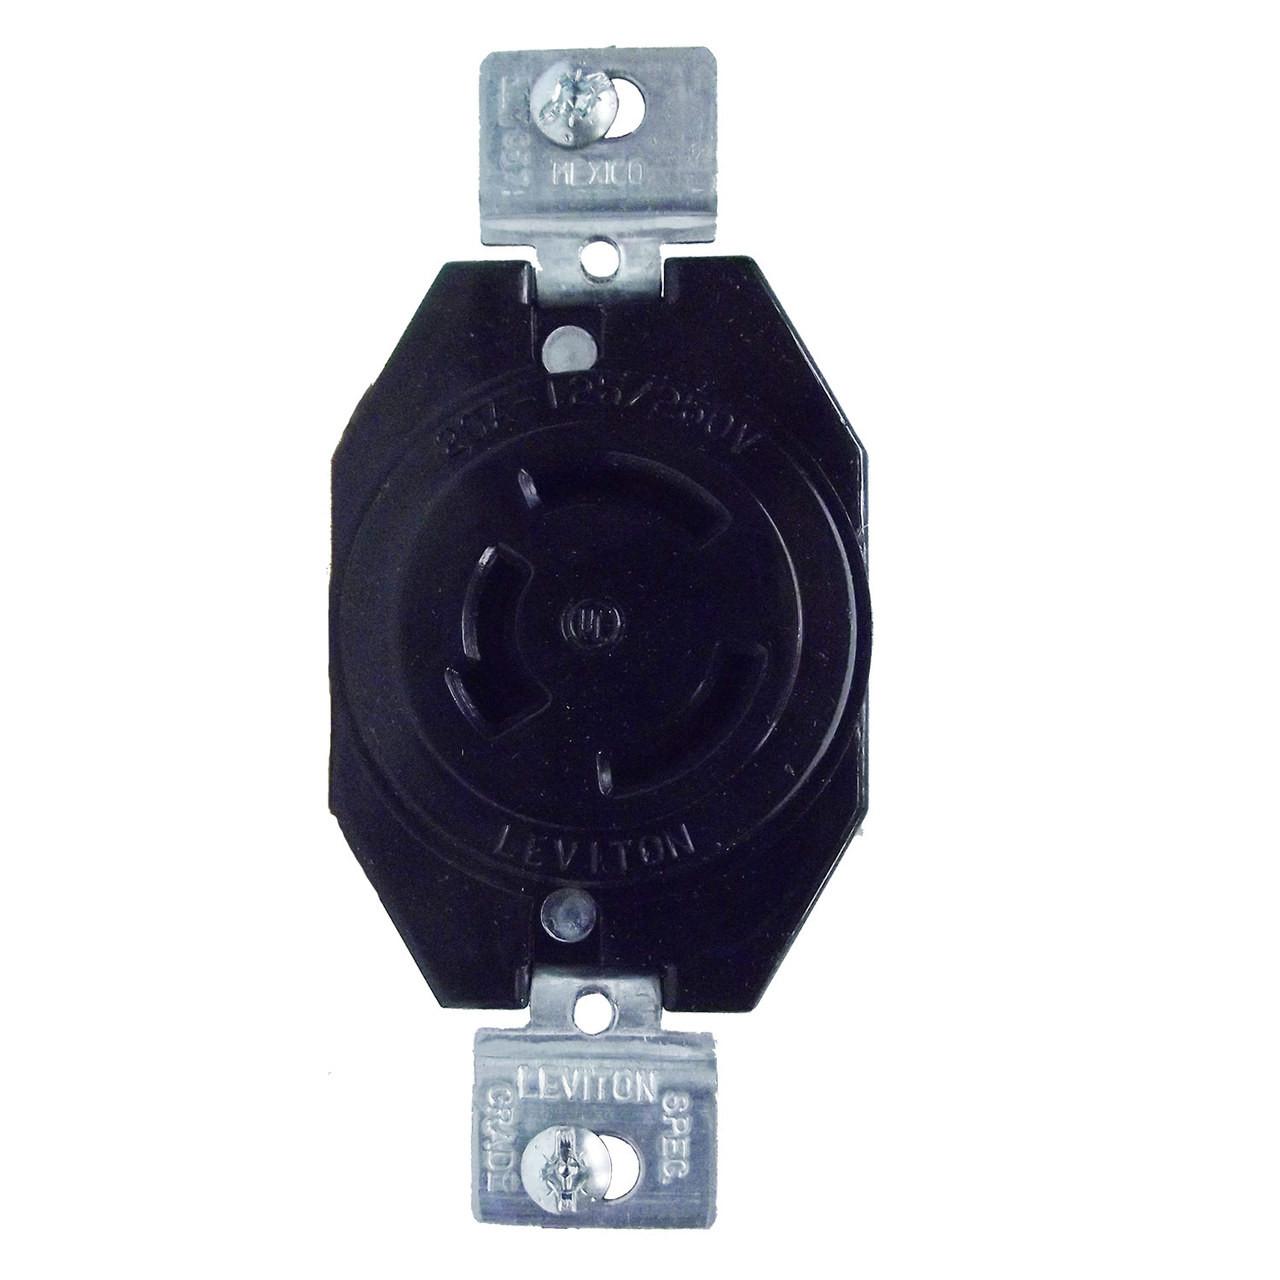 Leviton 7310-b  250 Volt 3 Pole Flush Mount